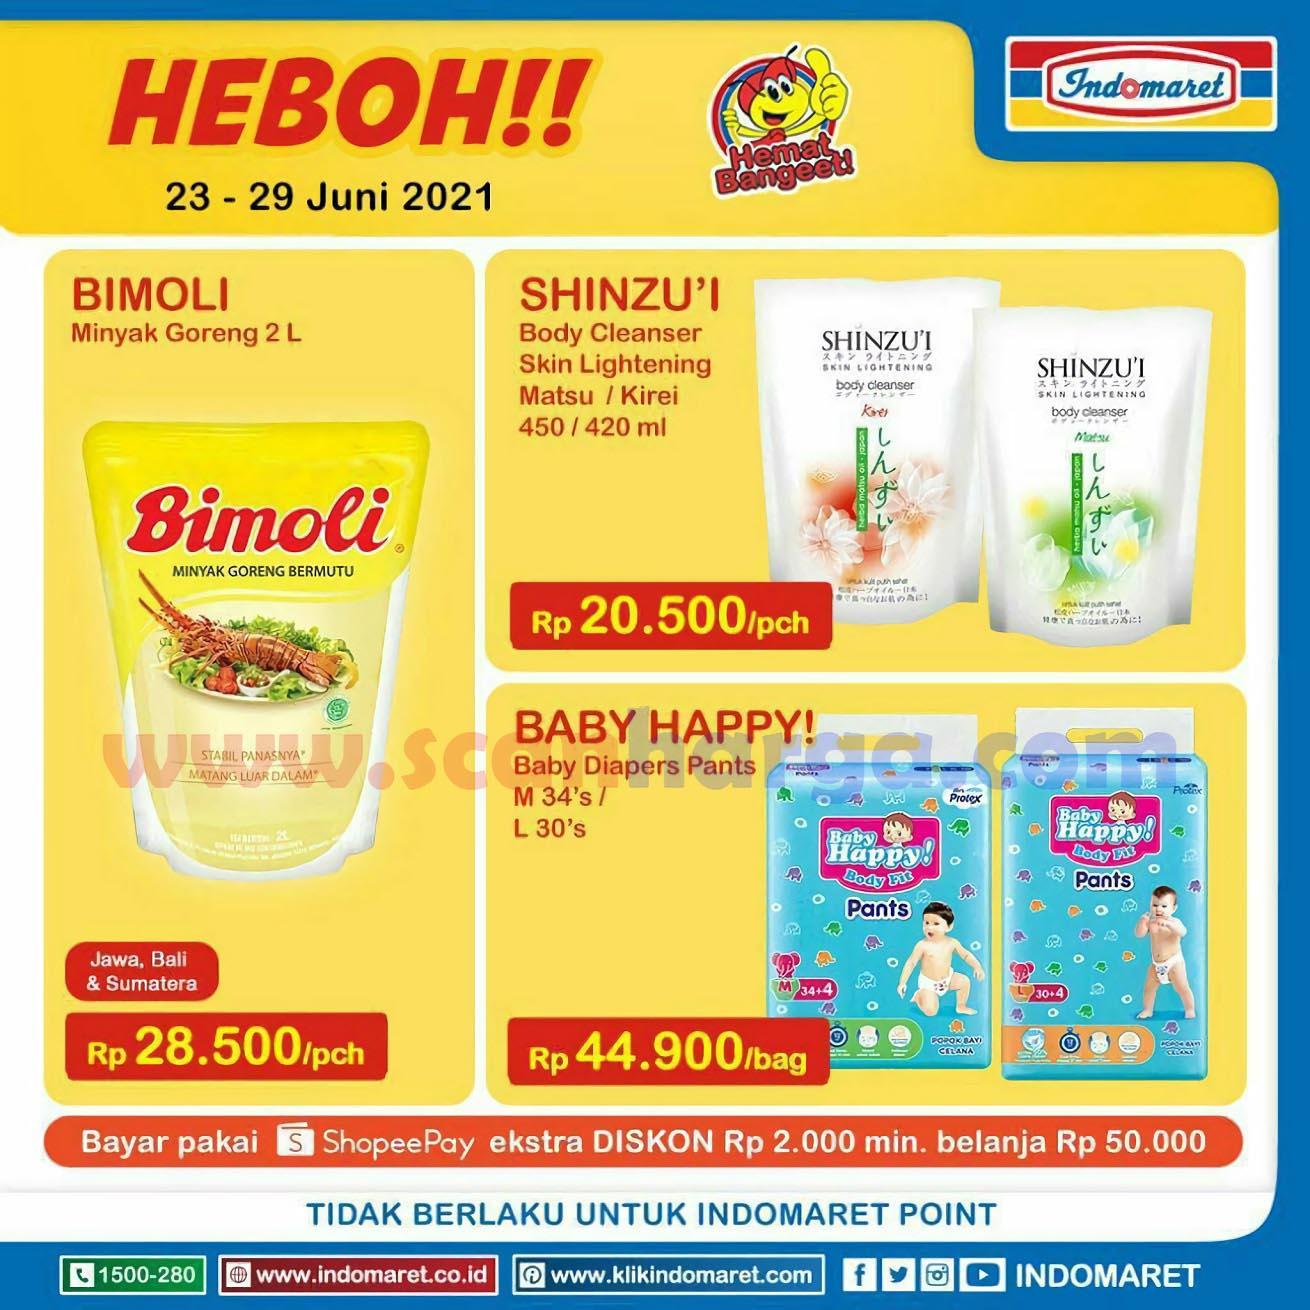 Promo Indomaret Heboh 23 - 29 Juni 2021 Harga Minyak Goreng & Susu Murah